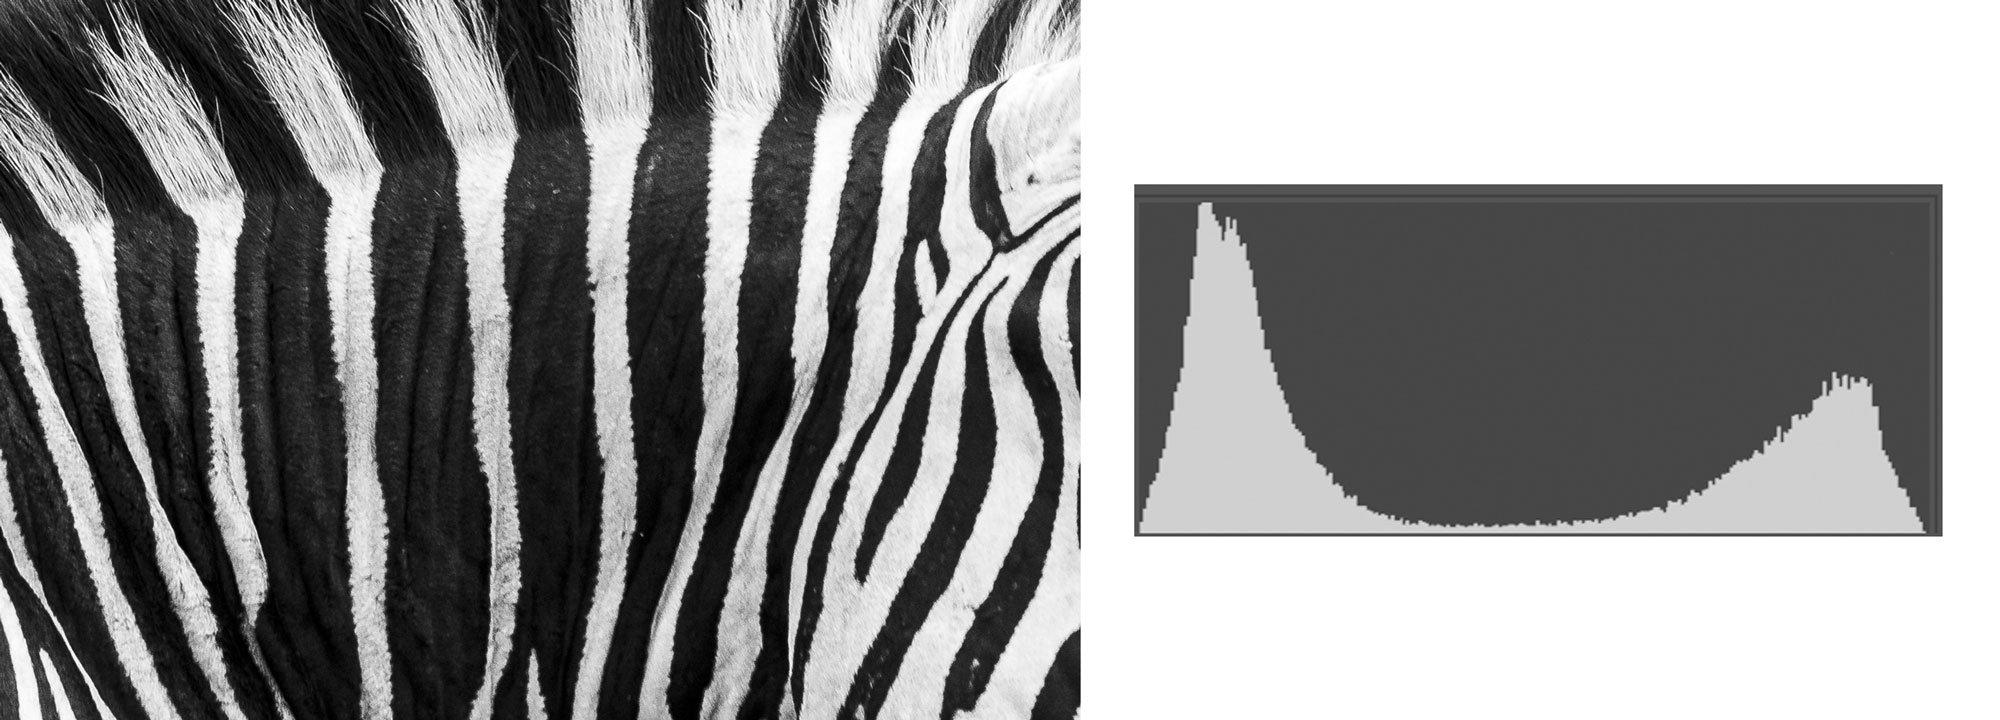 Zebra skin and histogram